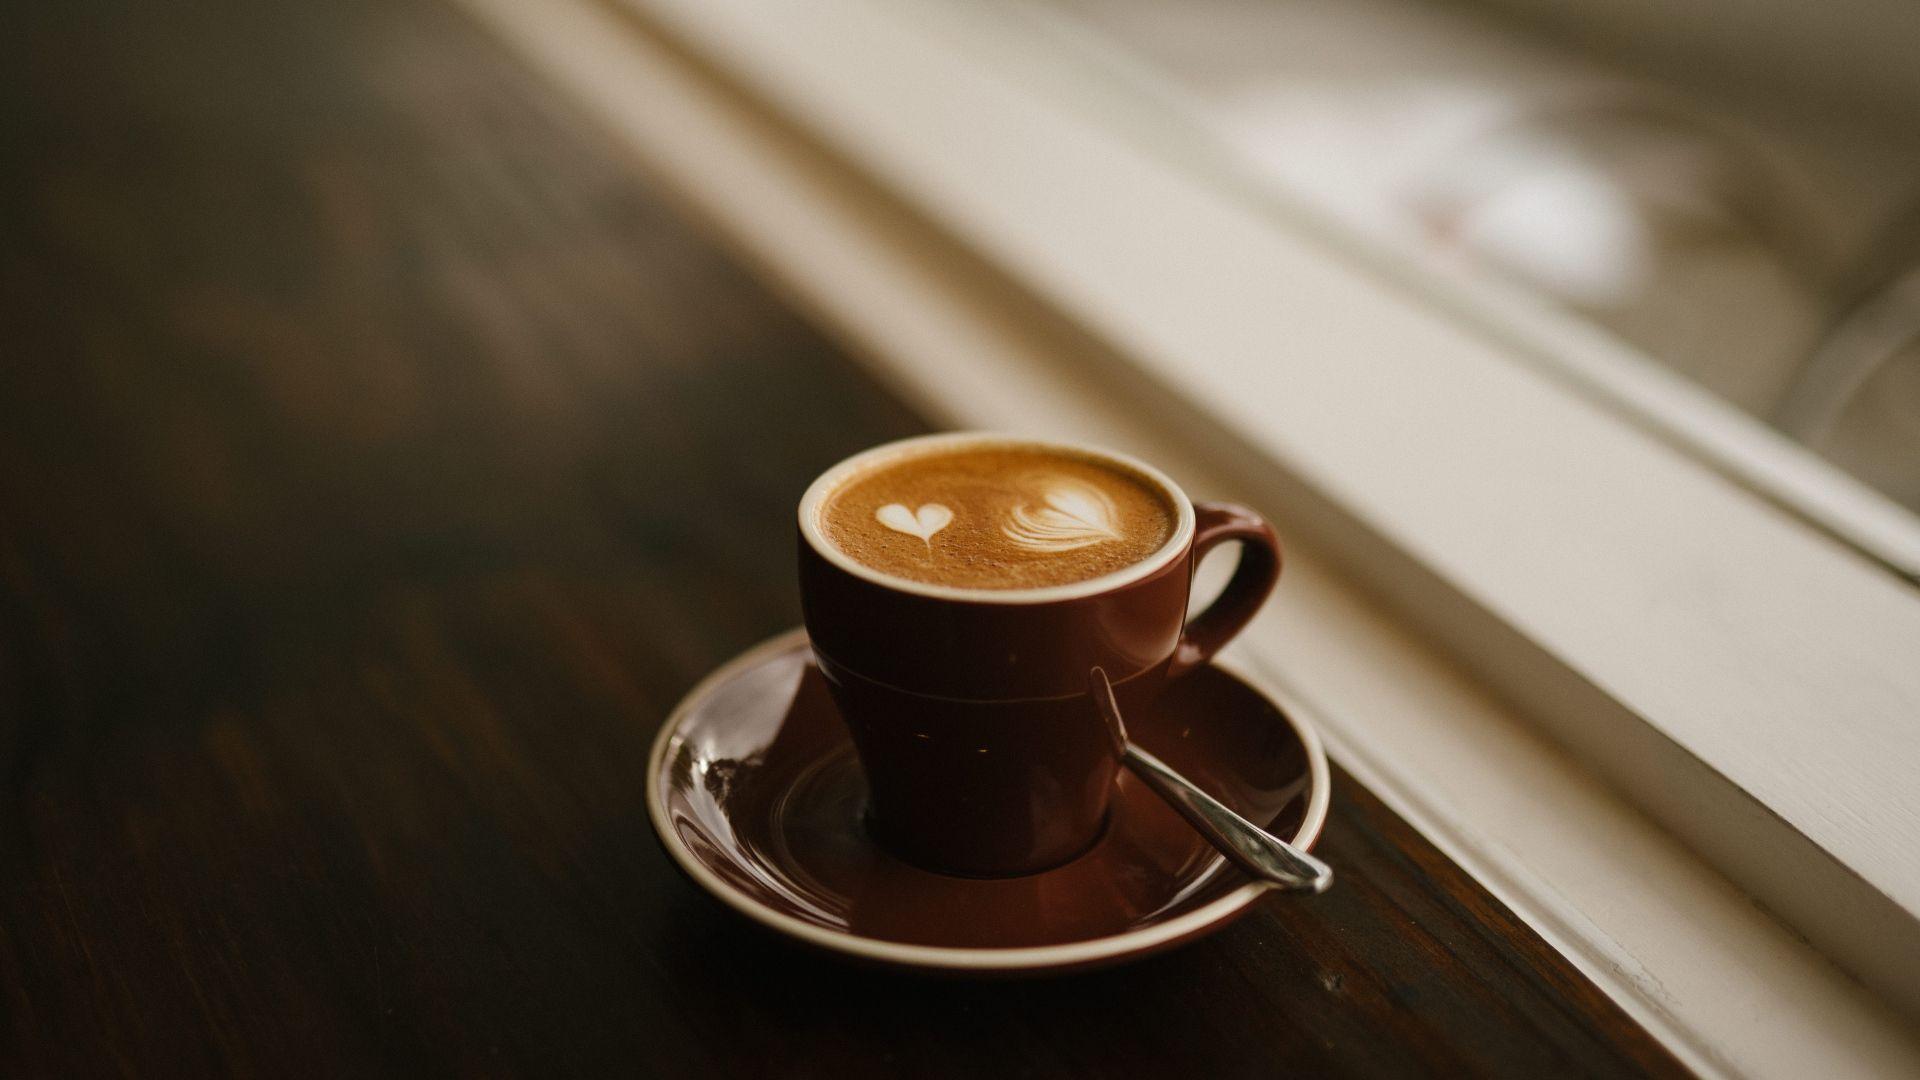 Coffee Desktop Wallpapers Top Free Coffee Desktop Backgrounds Wallpaperaccess